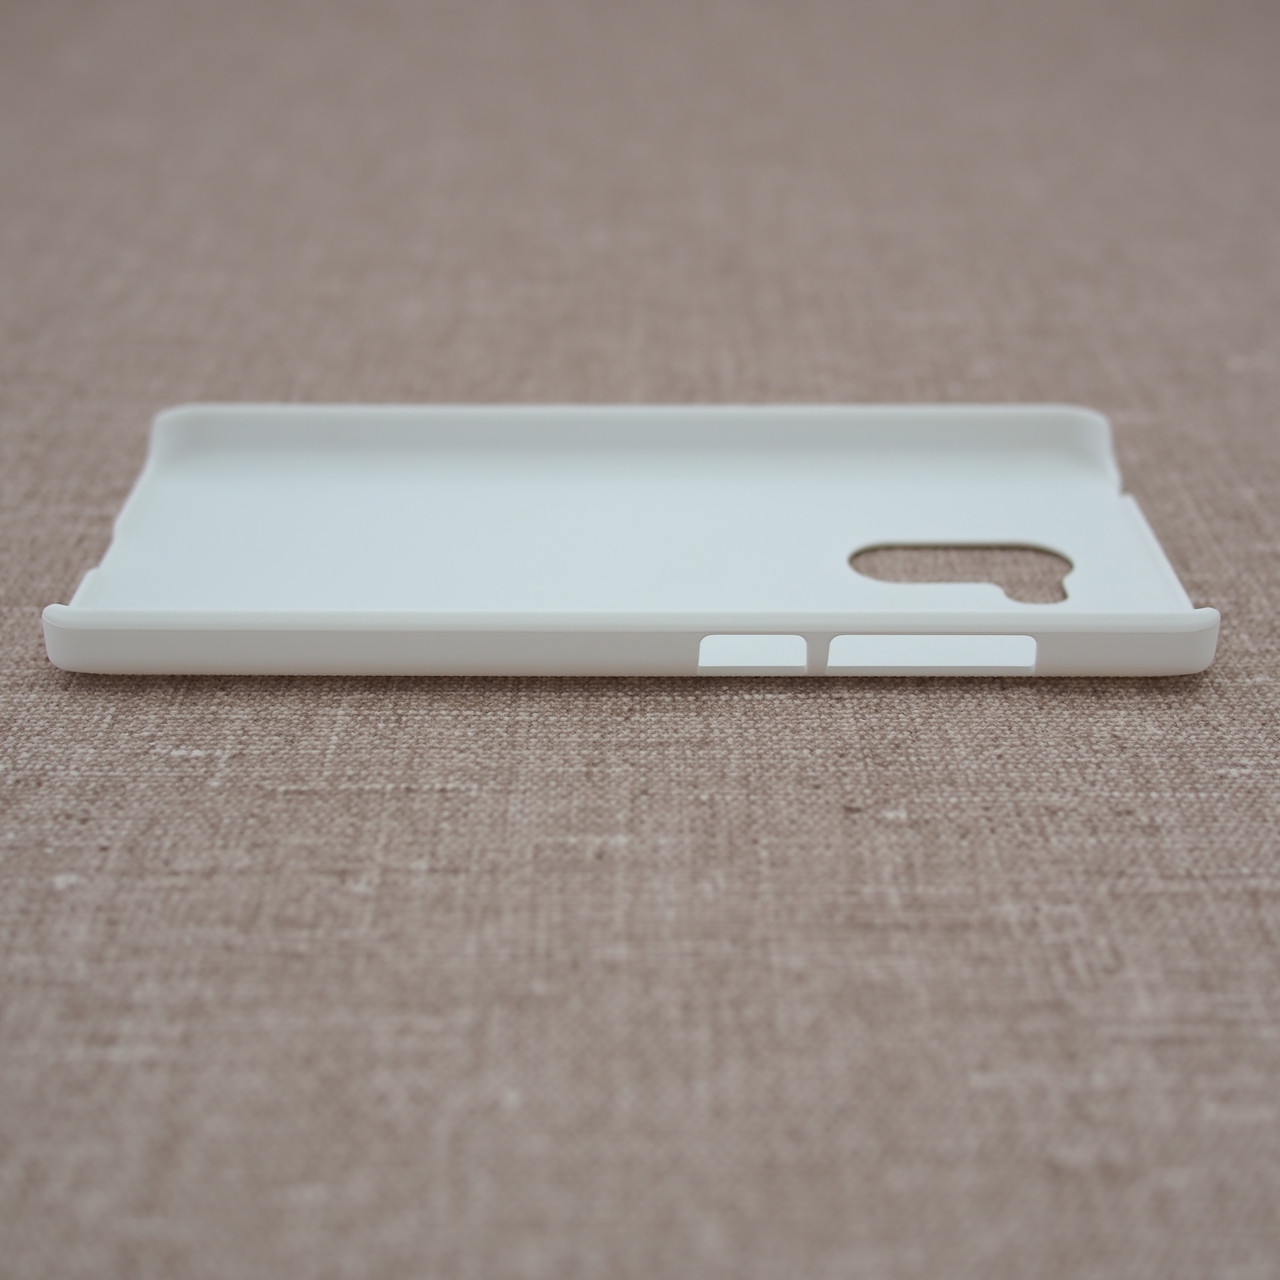 Накладка Nillkin Super Frosted Shield Xiaomi Redmi 4 Pro white Prime Для телефона